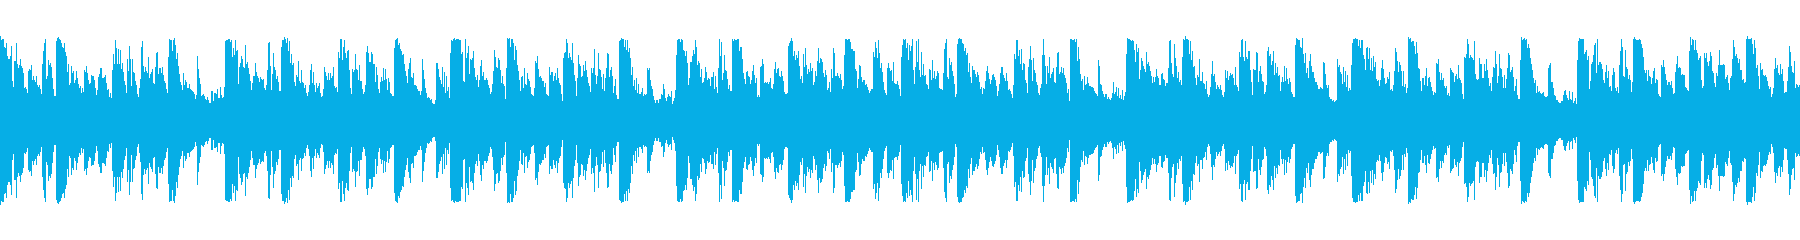 CMに躍動感、かっこいい、シンセ Sの再生済みの波形